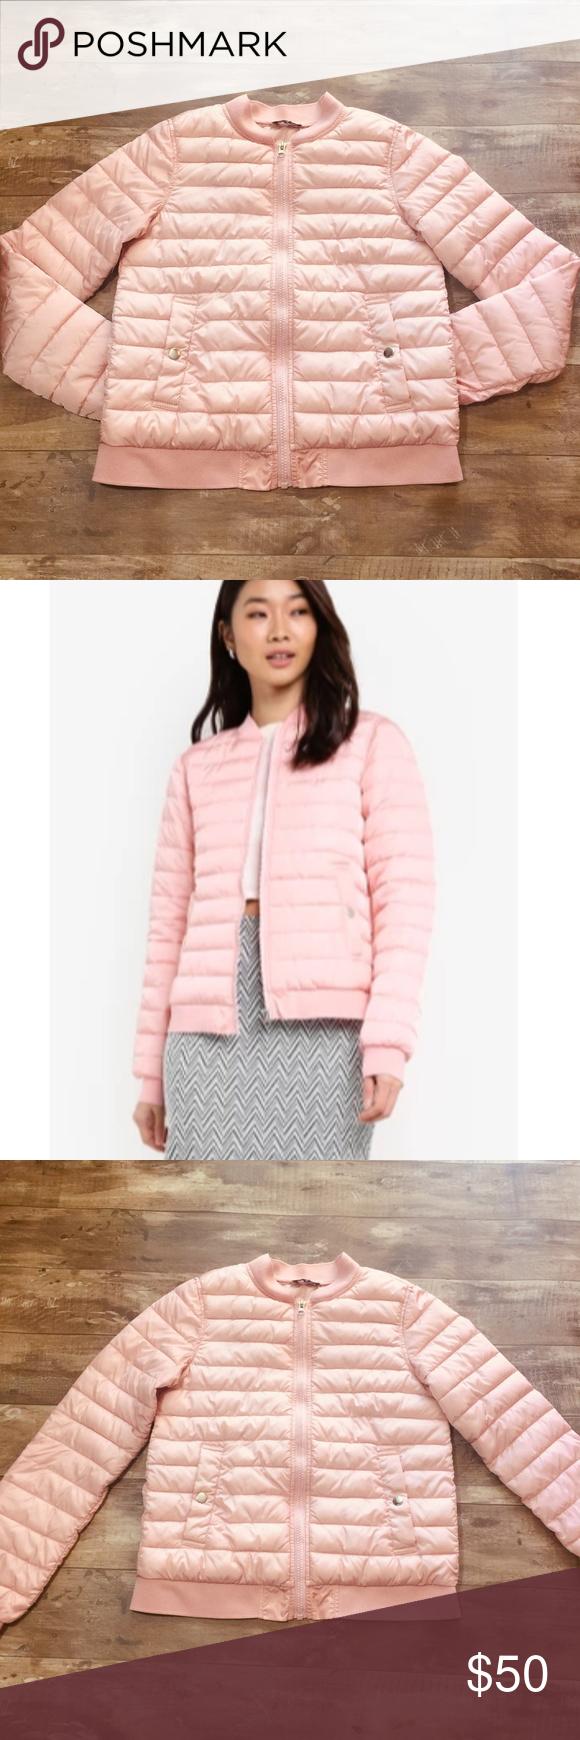 Pink Puffer Jacket Euc Clothes Design Jackets Fashion [ 1740 x 580 Pixel ]